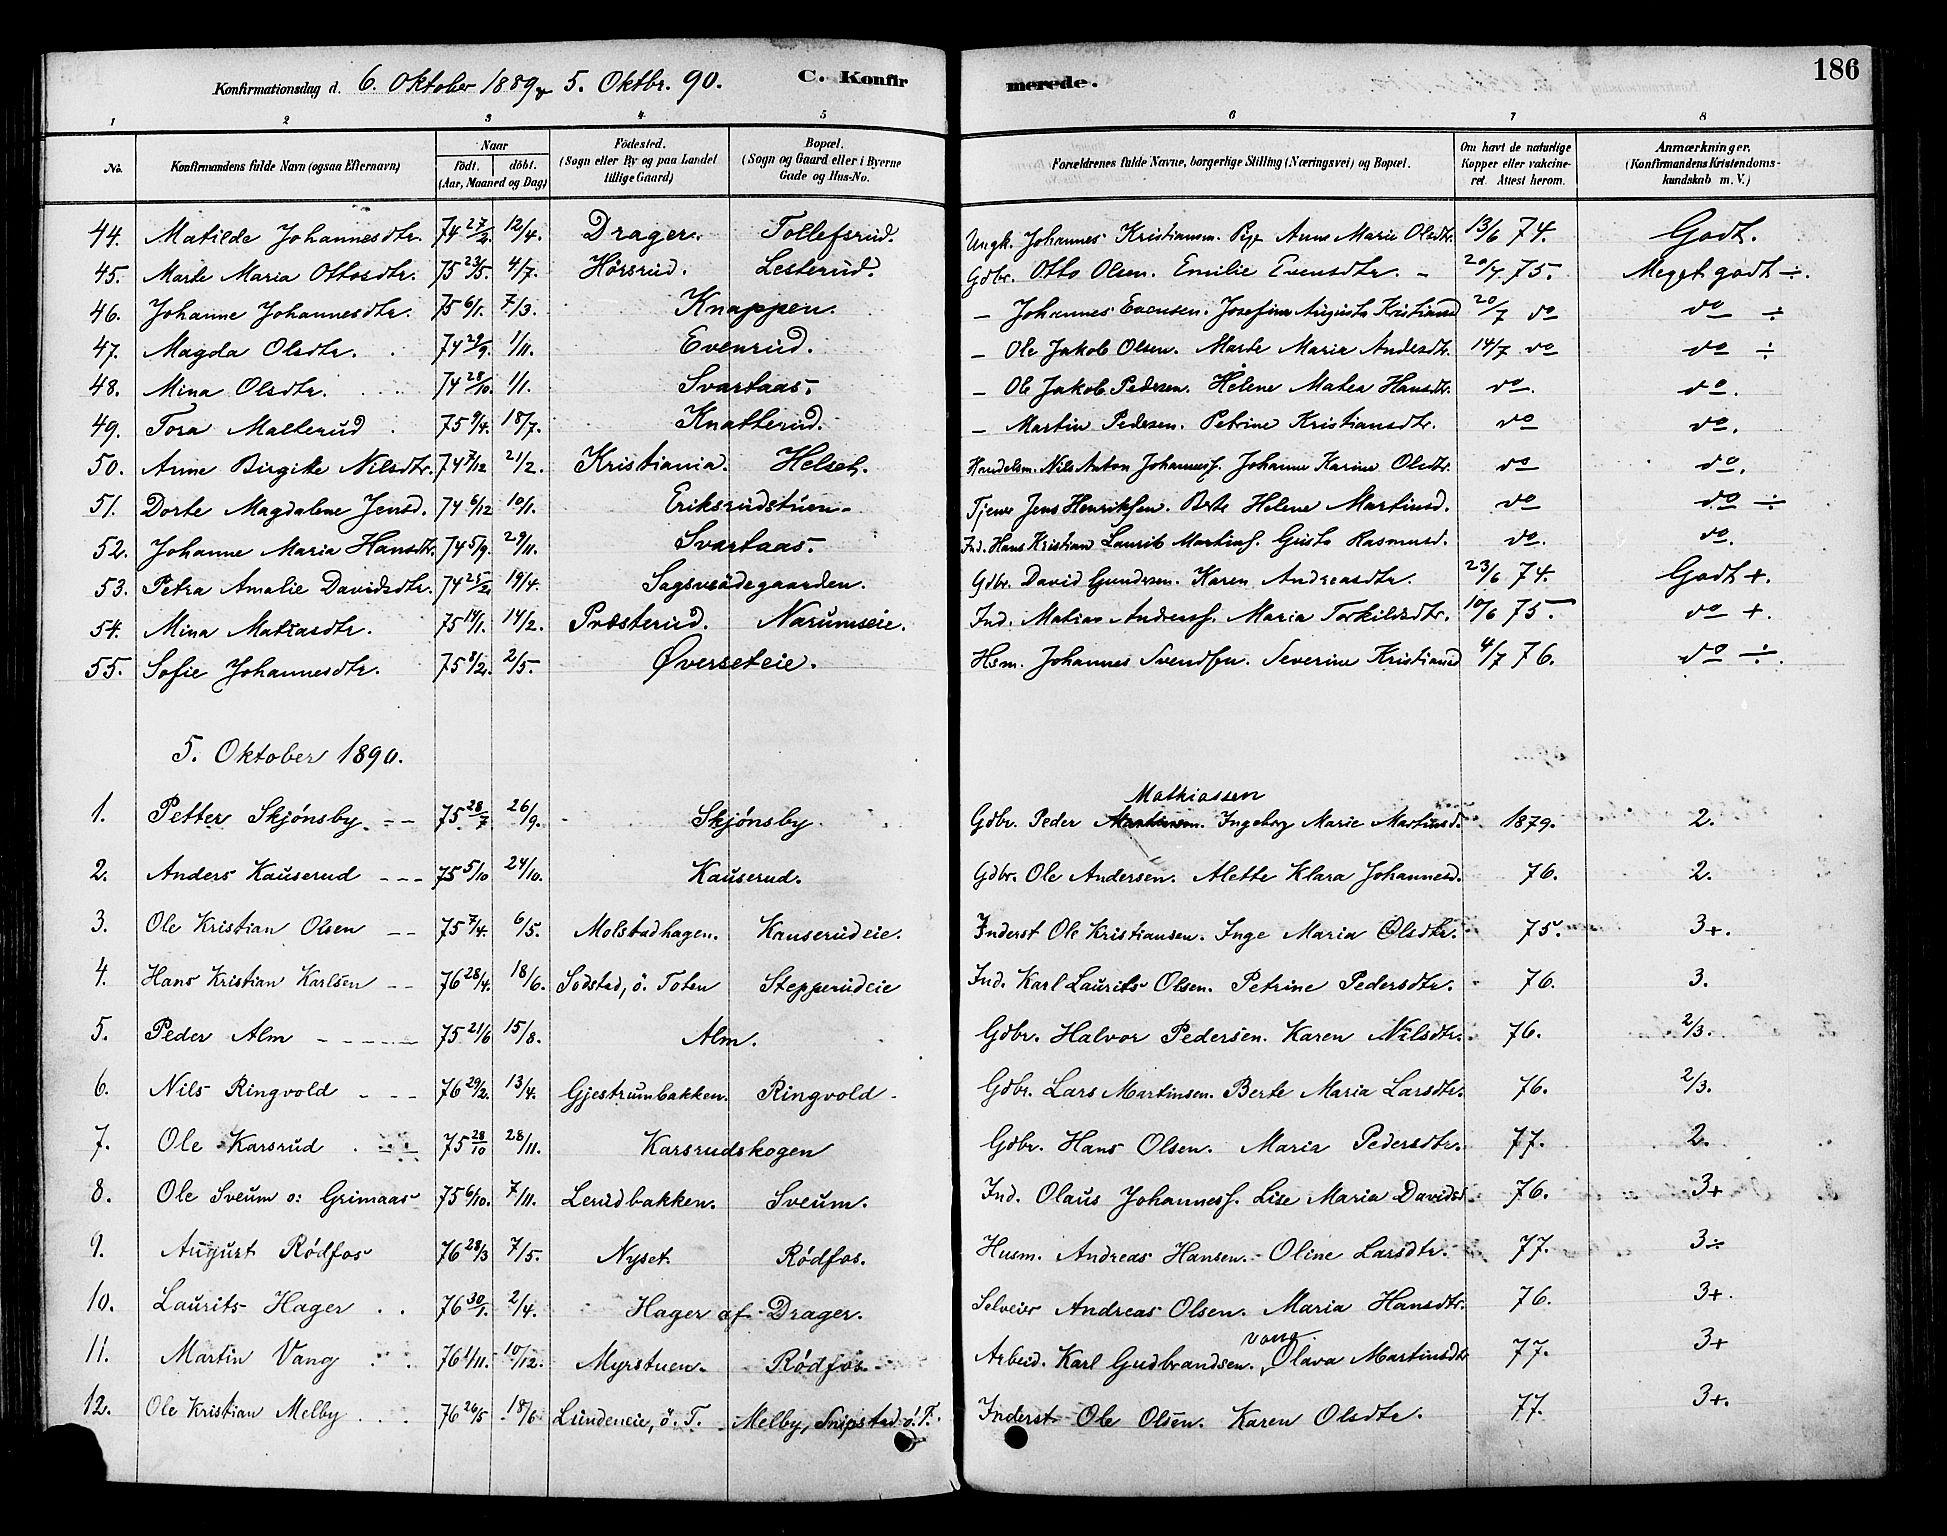 SAH, Vestre Toten prestekontor, H/Ha/Haa/L0009: Ministerialbok nr. 9, 1878-1894, s. 186